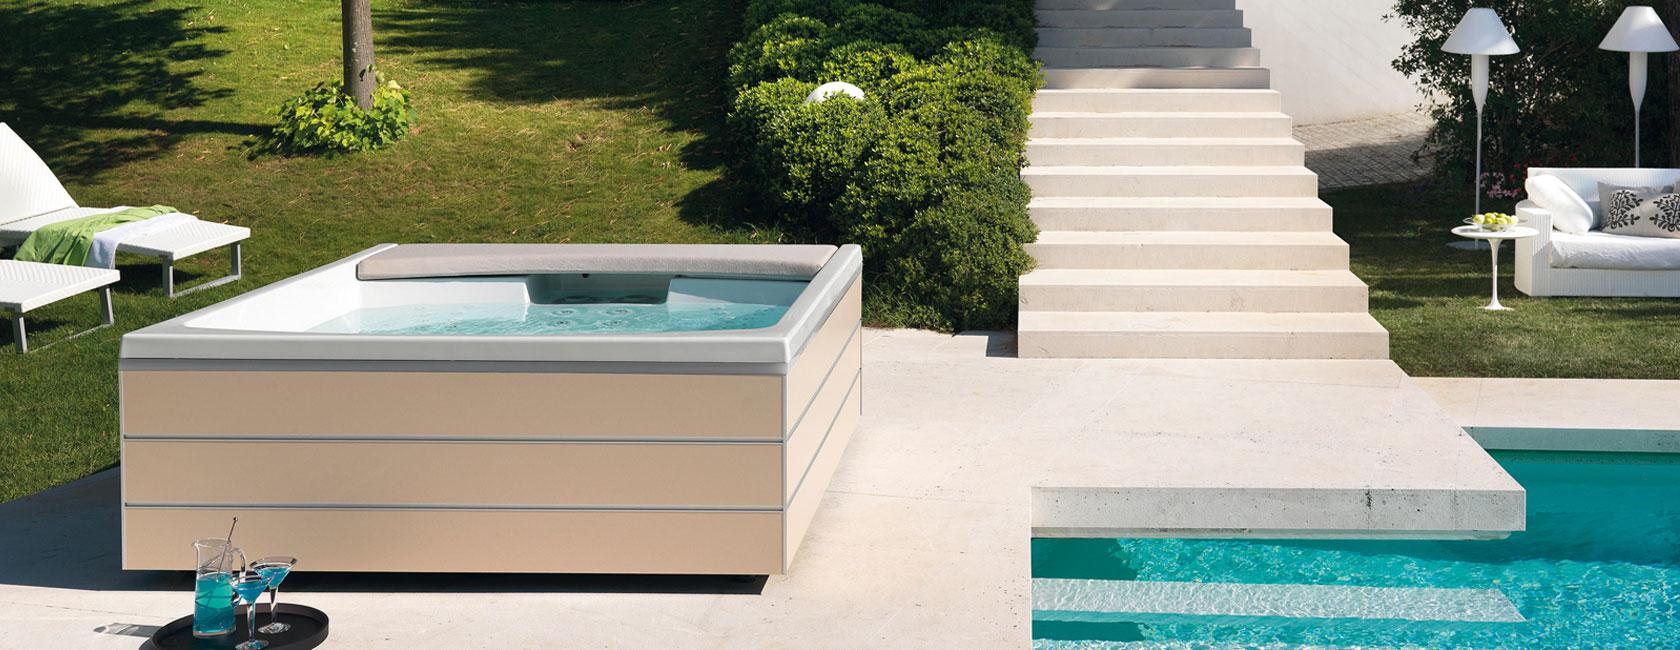 Minipiscine e vasche idromassaggio da esterno tassonedil - Piscina jacuzzi da esterno ...